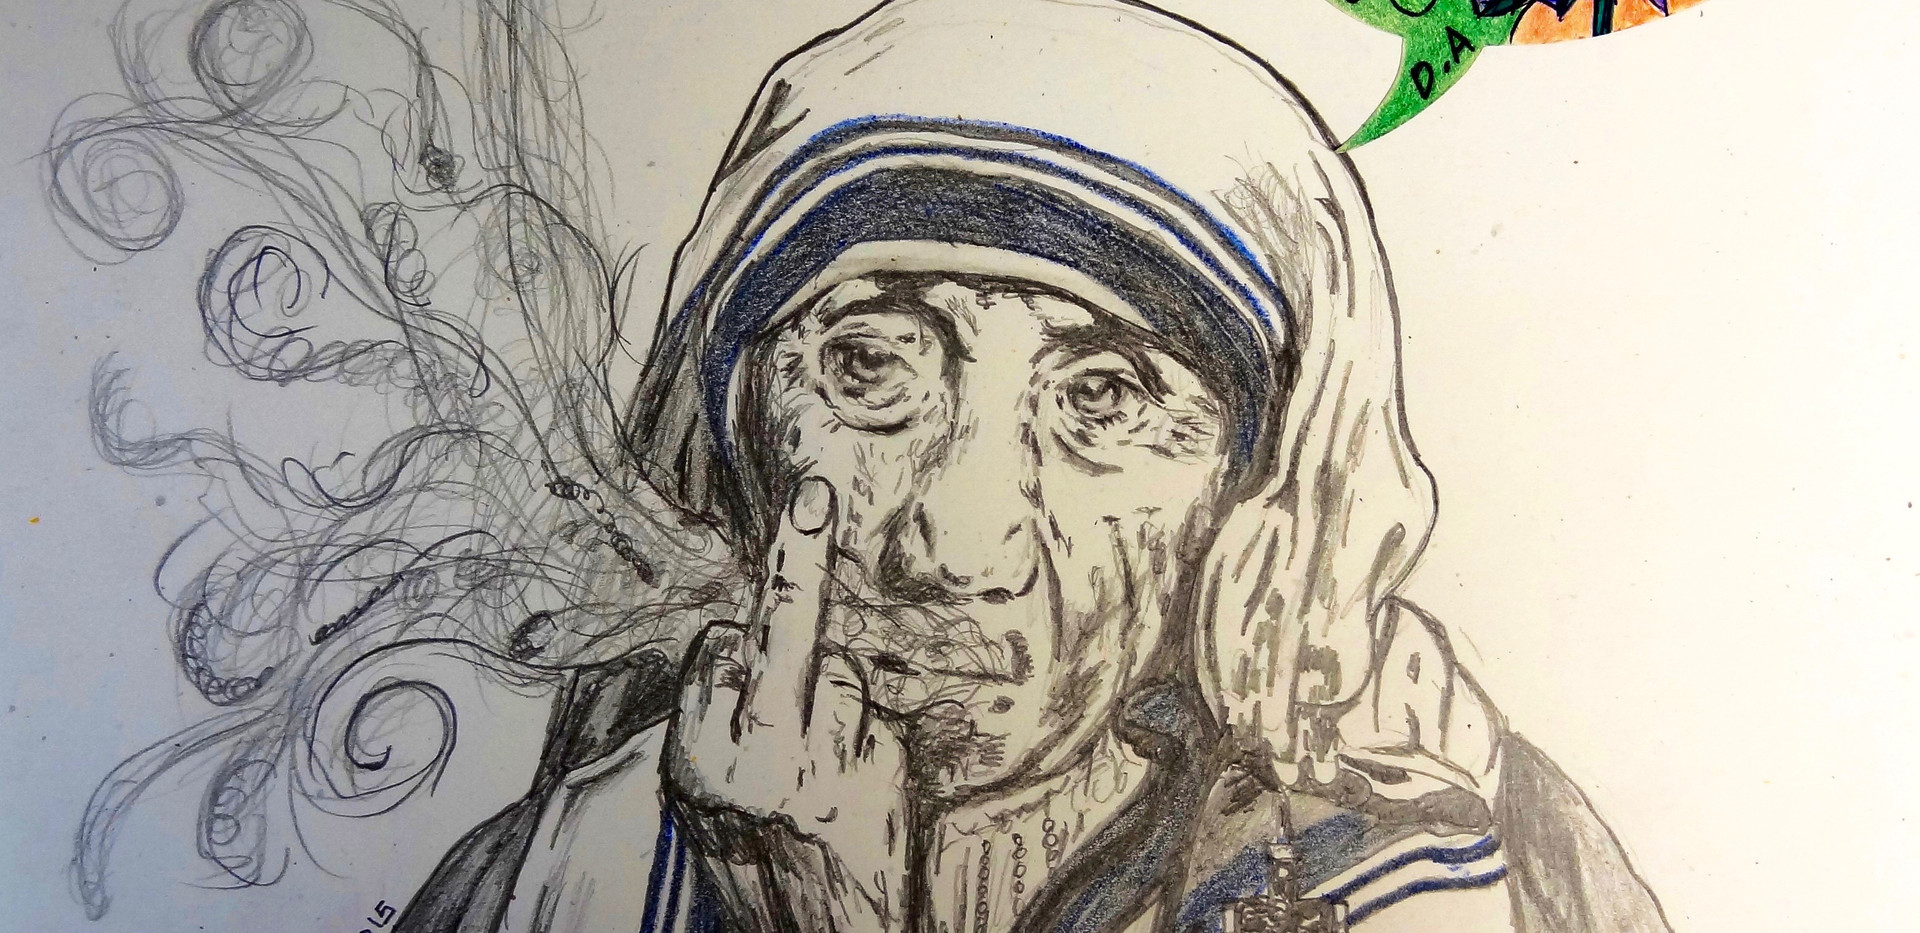 La Madre Teresa Loqueando. Pencil on Paper.